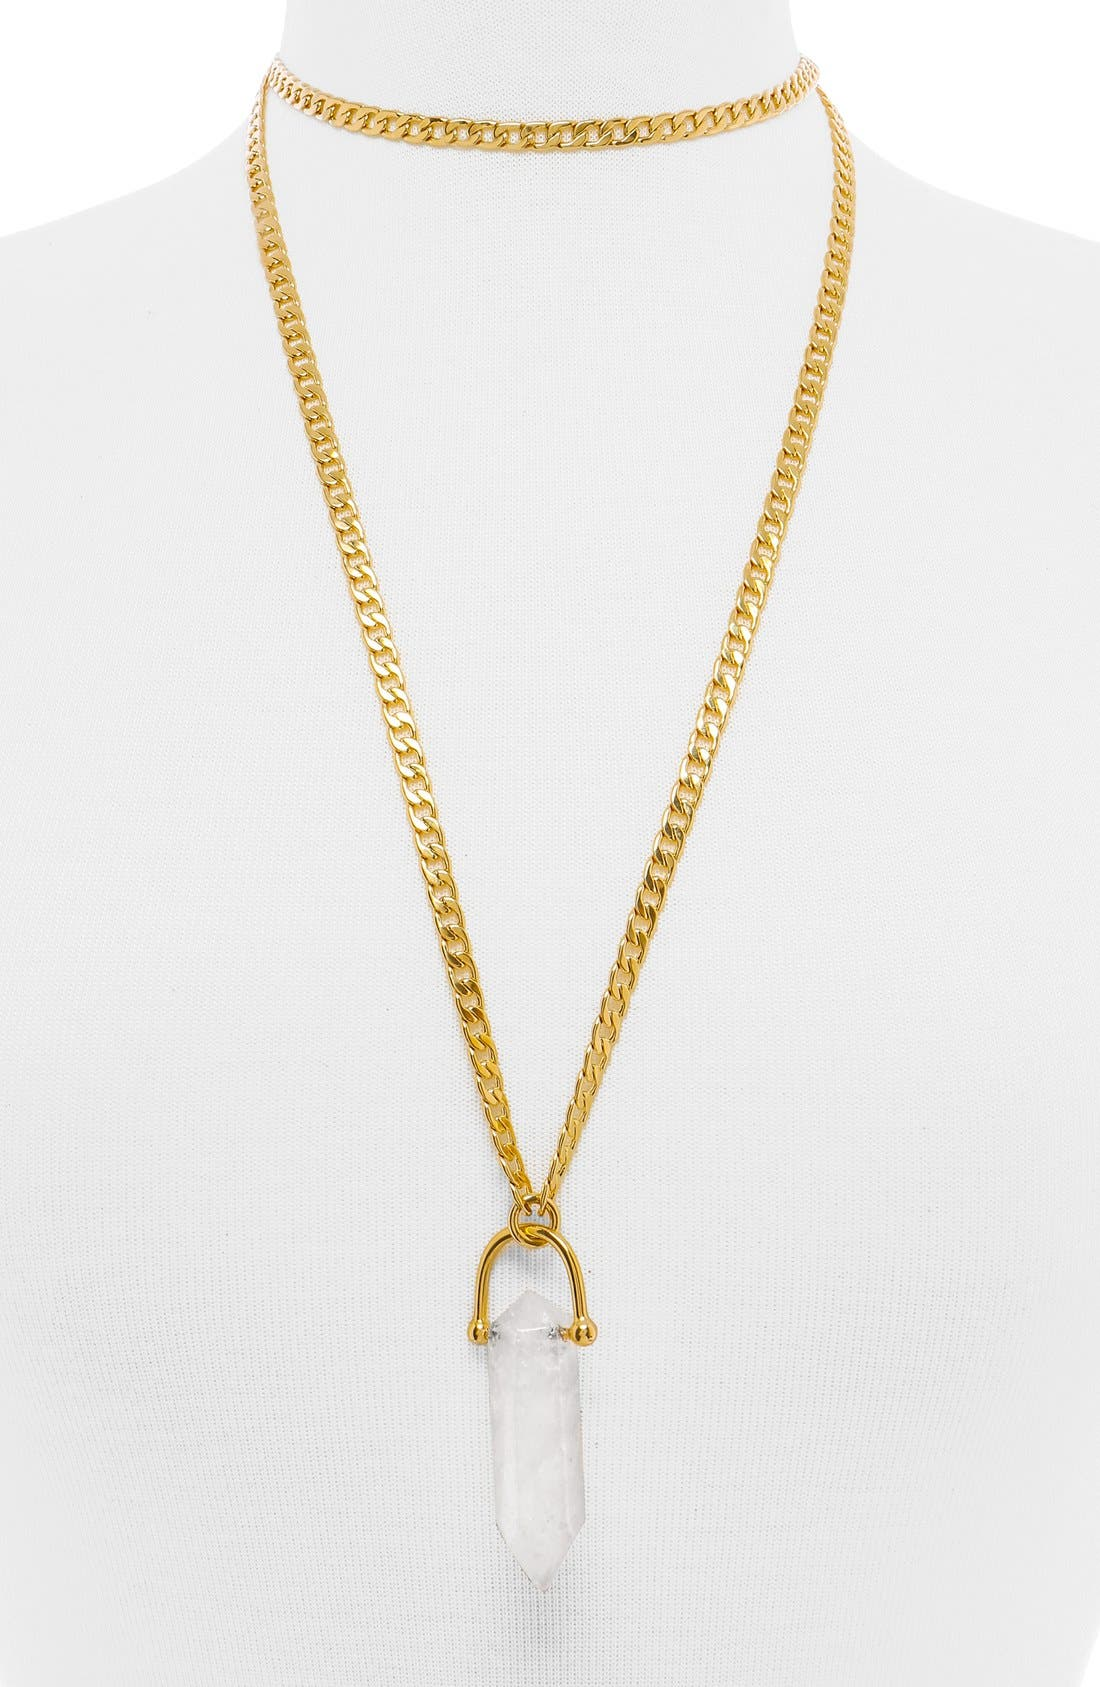 Main Image - BaubleBar x Olivia Palermo Quartz Pendant Necklace